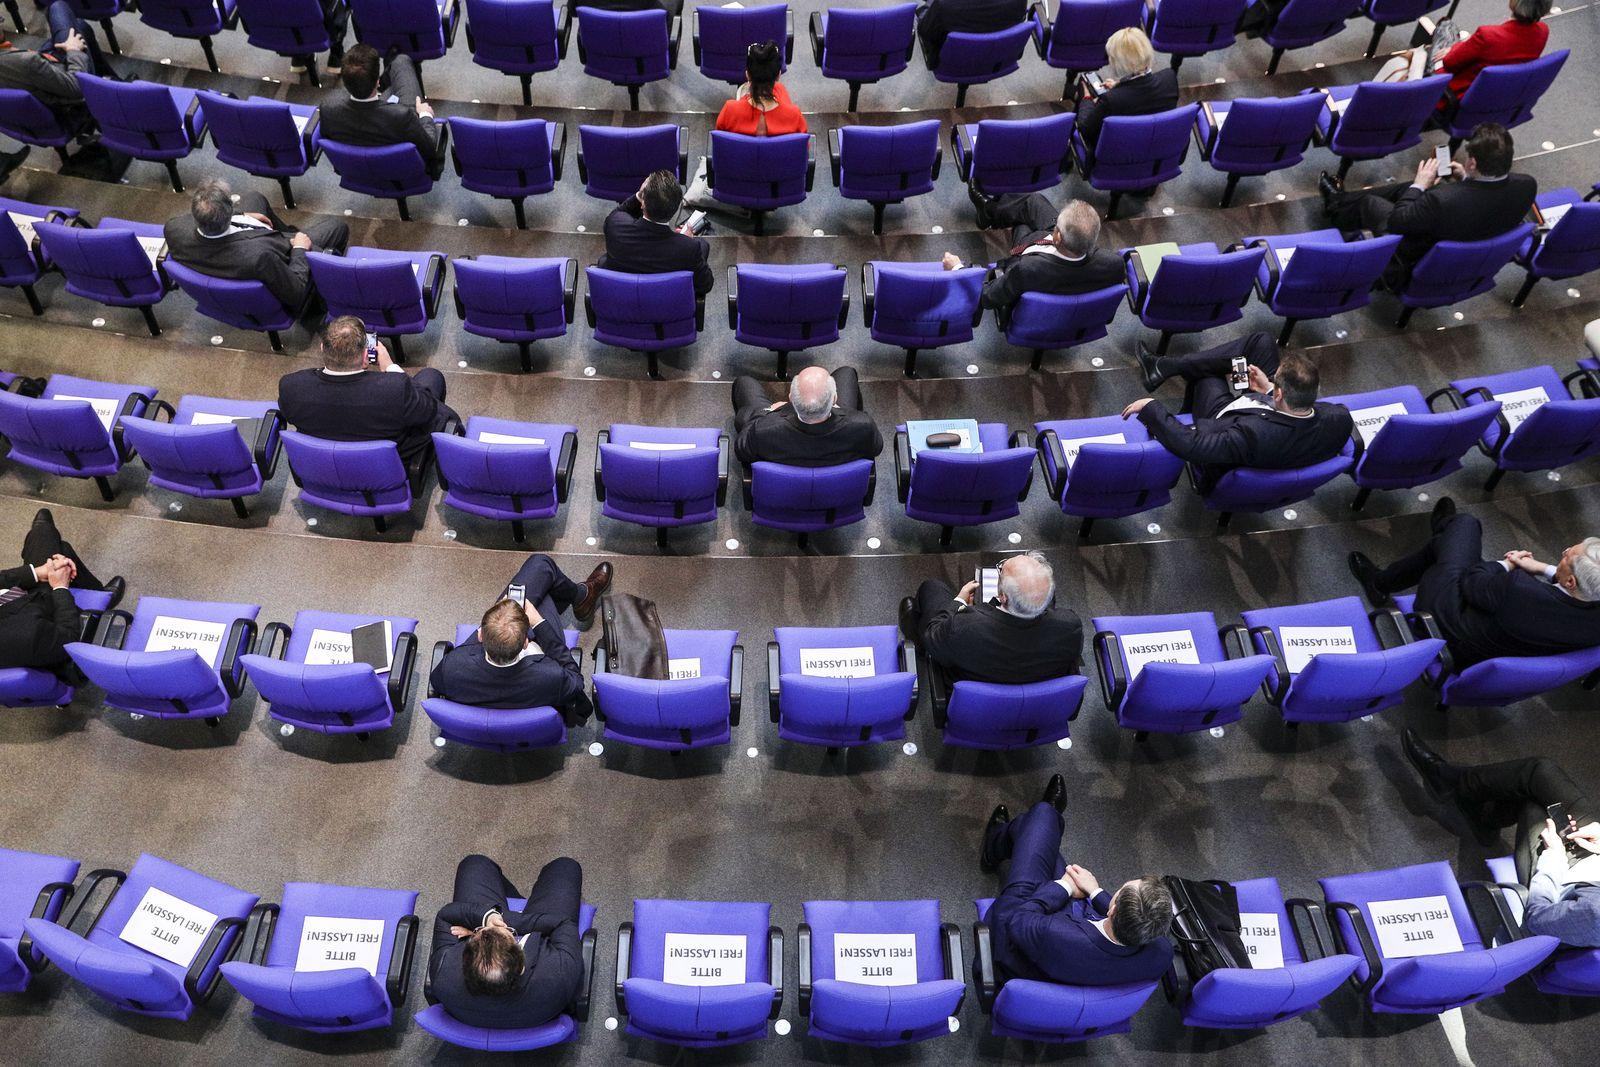 Germany Bundestag session sitting arrangement due to Coronavirus, Berlin - 25 Mar 2020